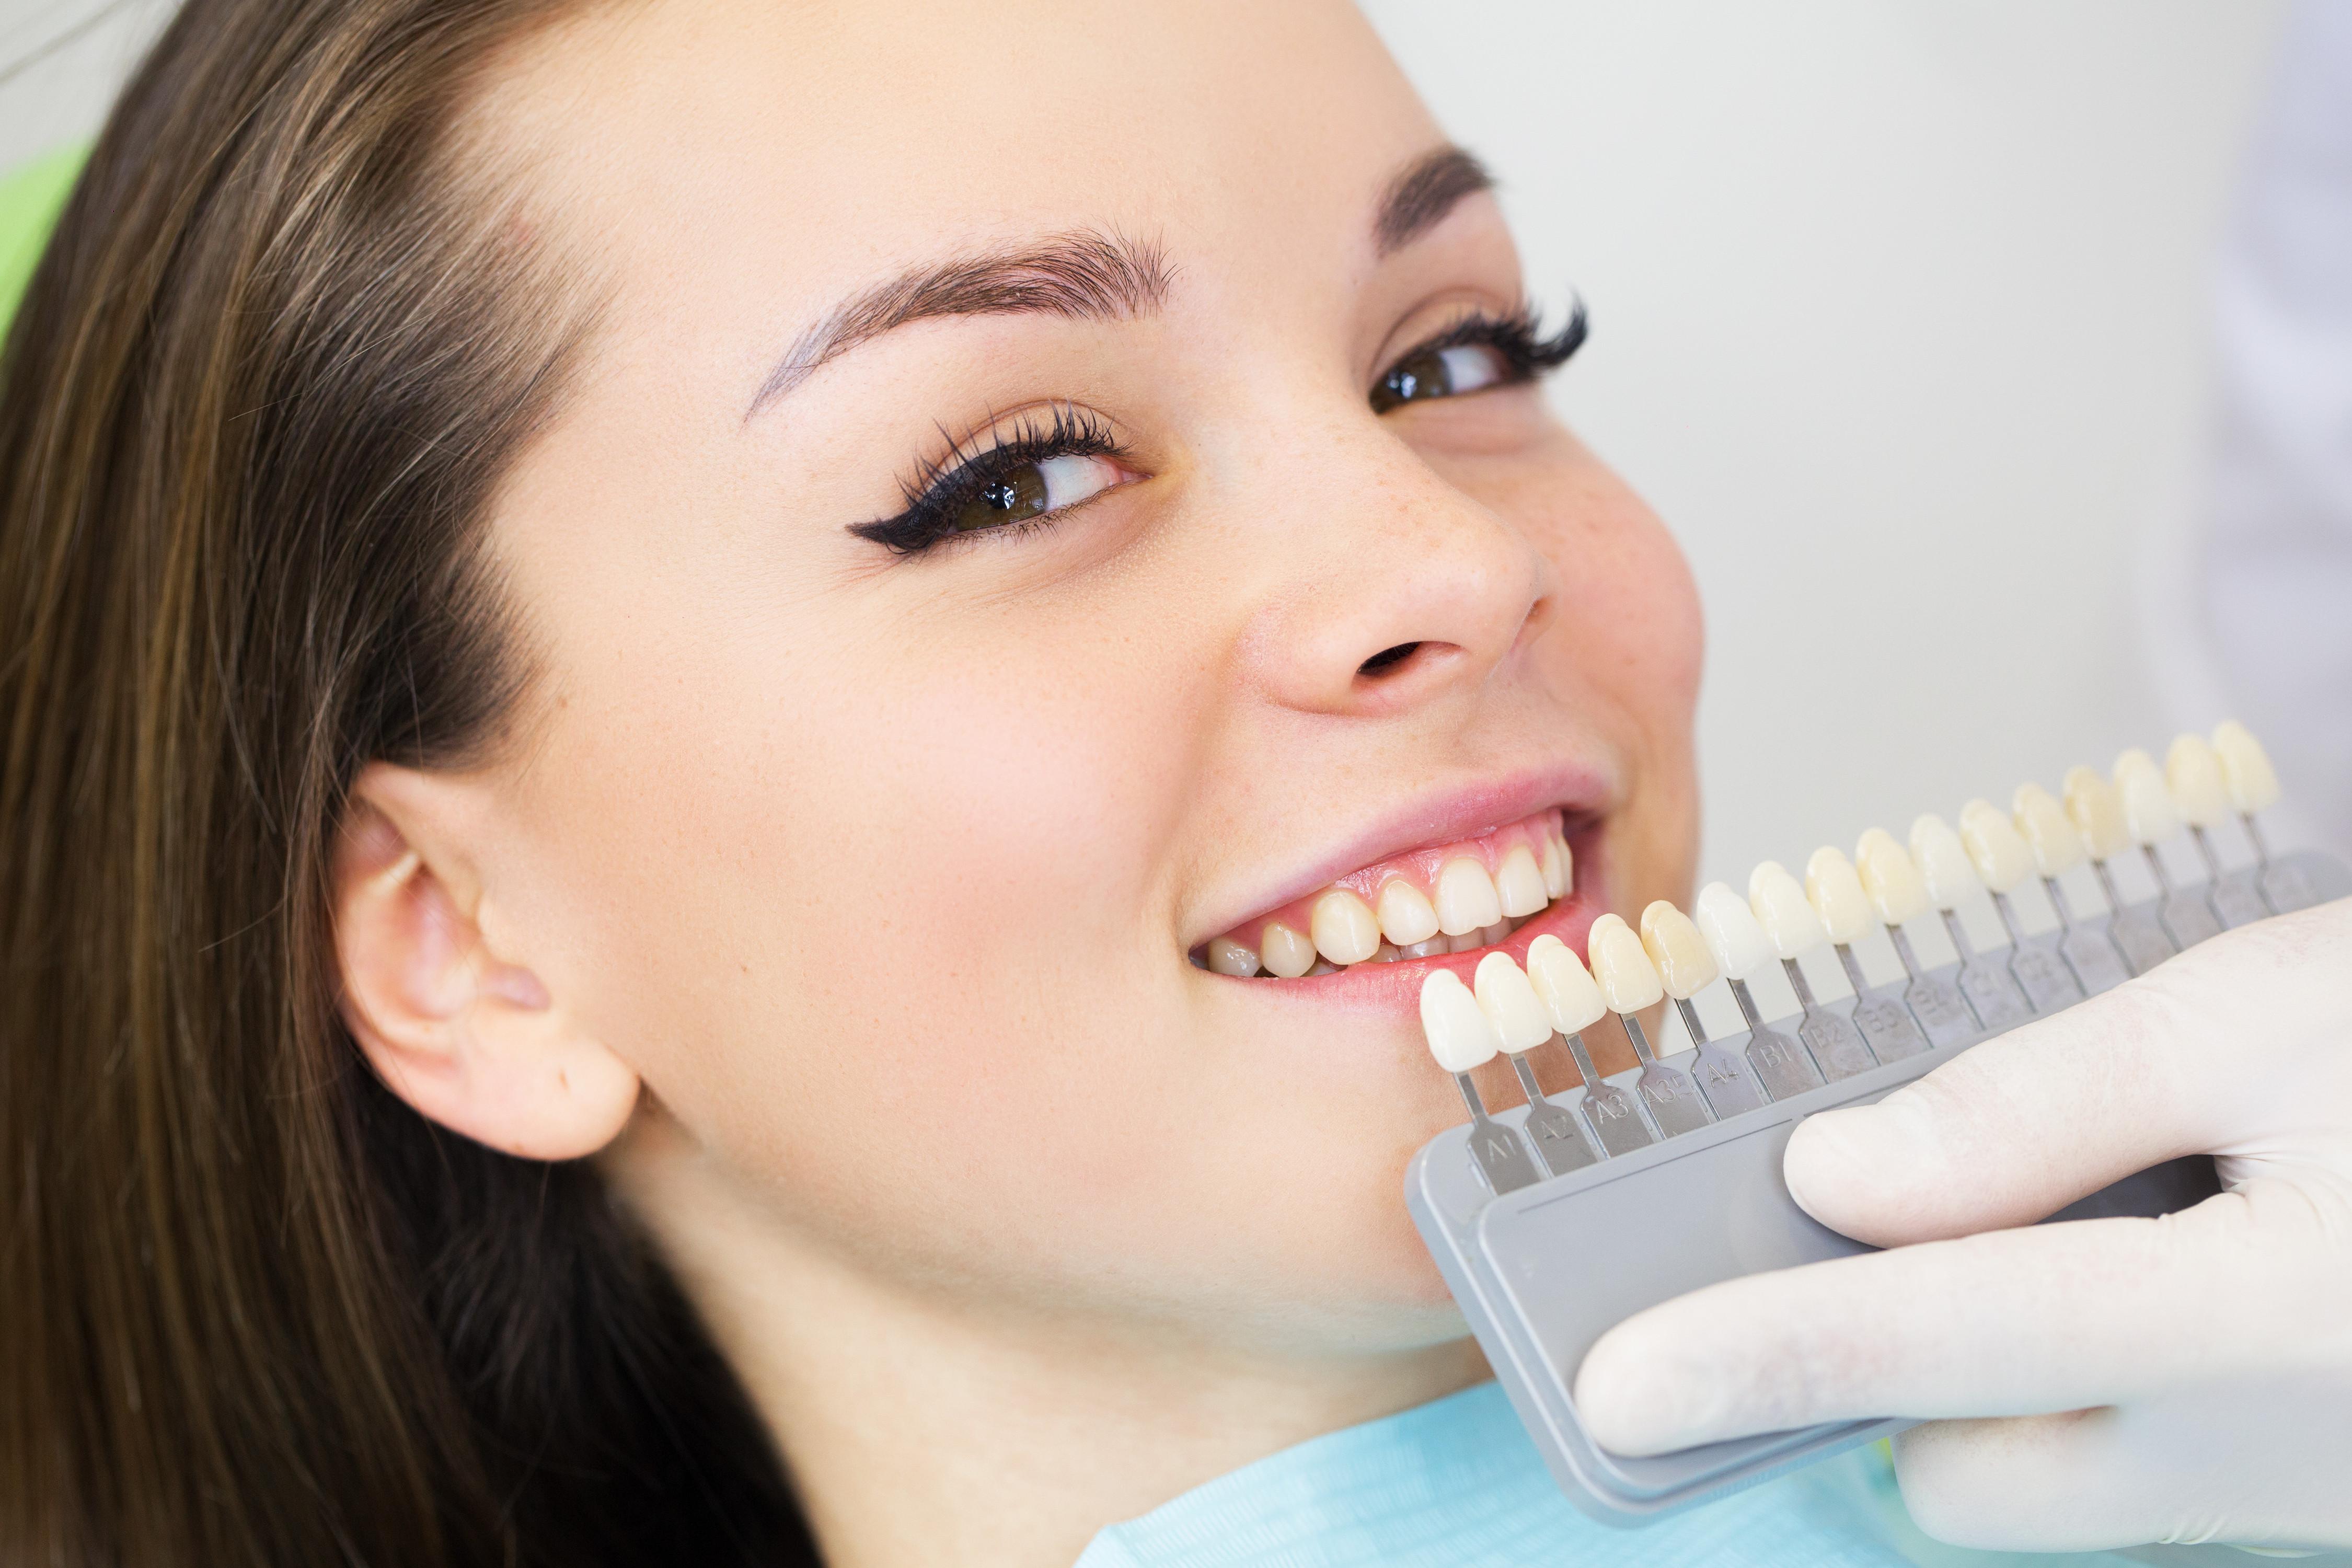 20 Min Teeth Whitening Session